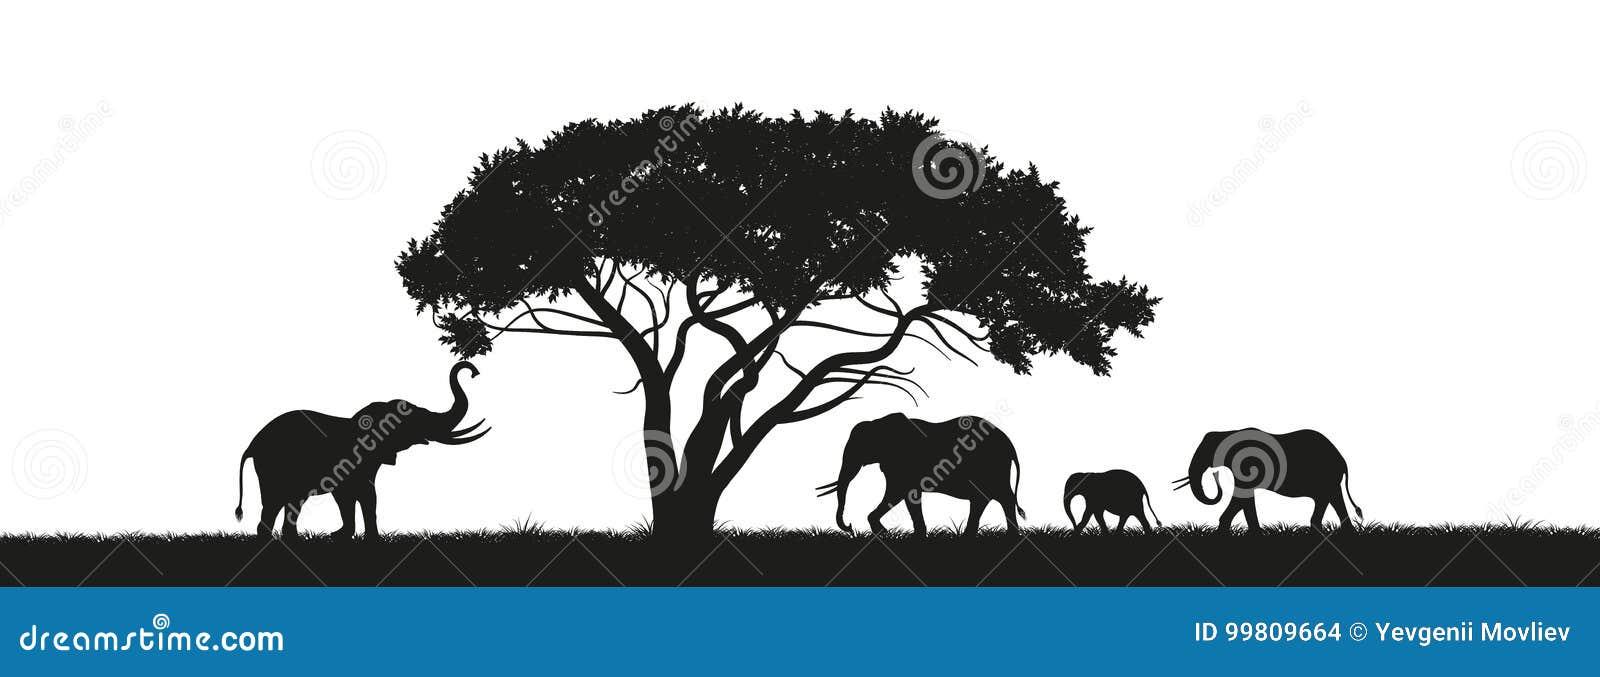 Silueta negra de elefantes en sabana Animales de África Paisaje africano Panorama de la naturaleza salvaje